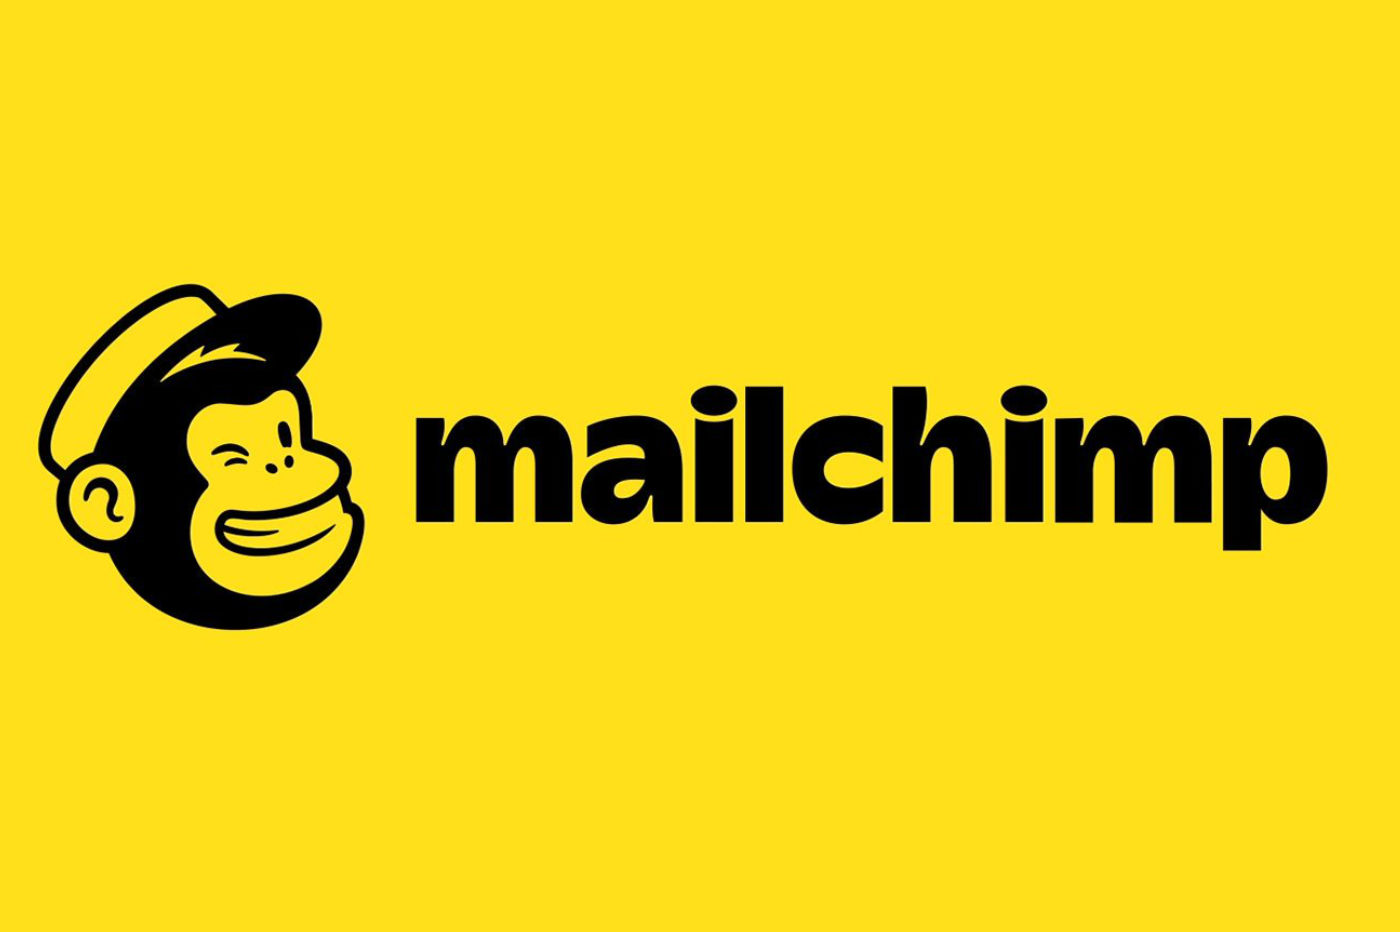 mailchimp emailing